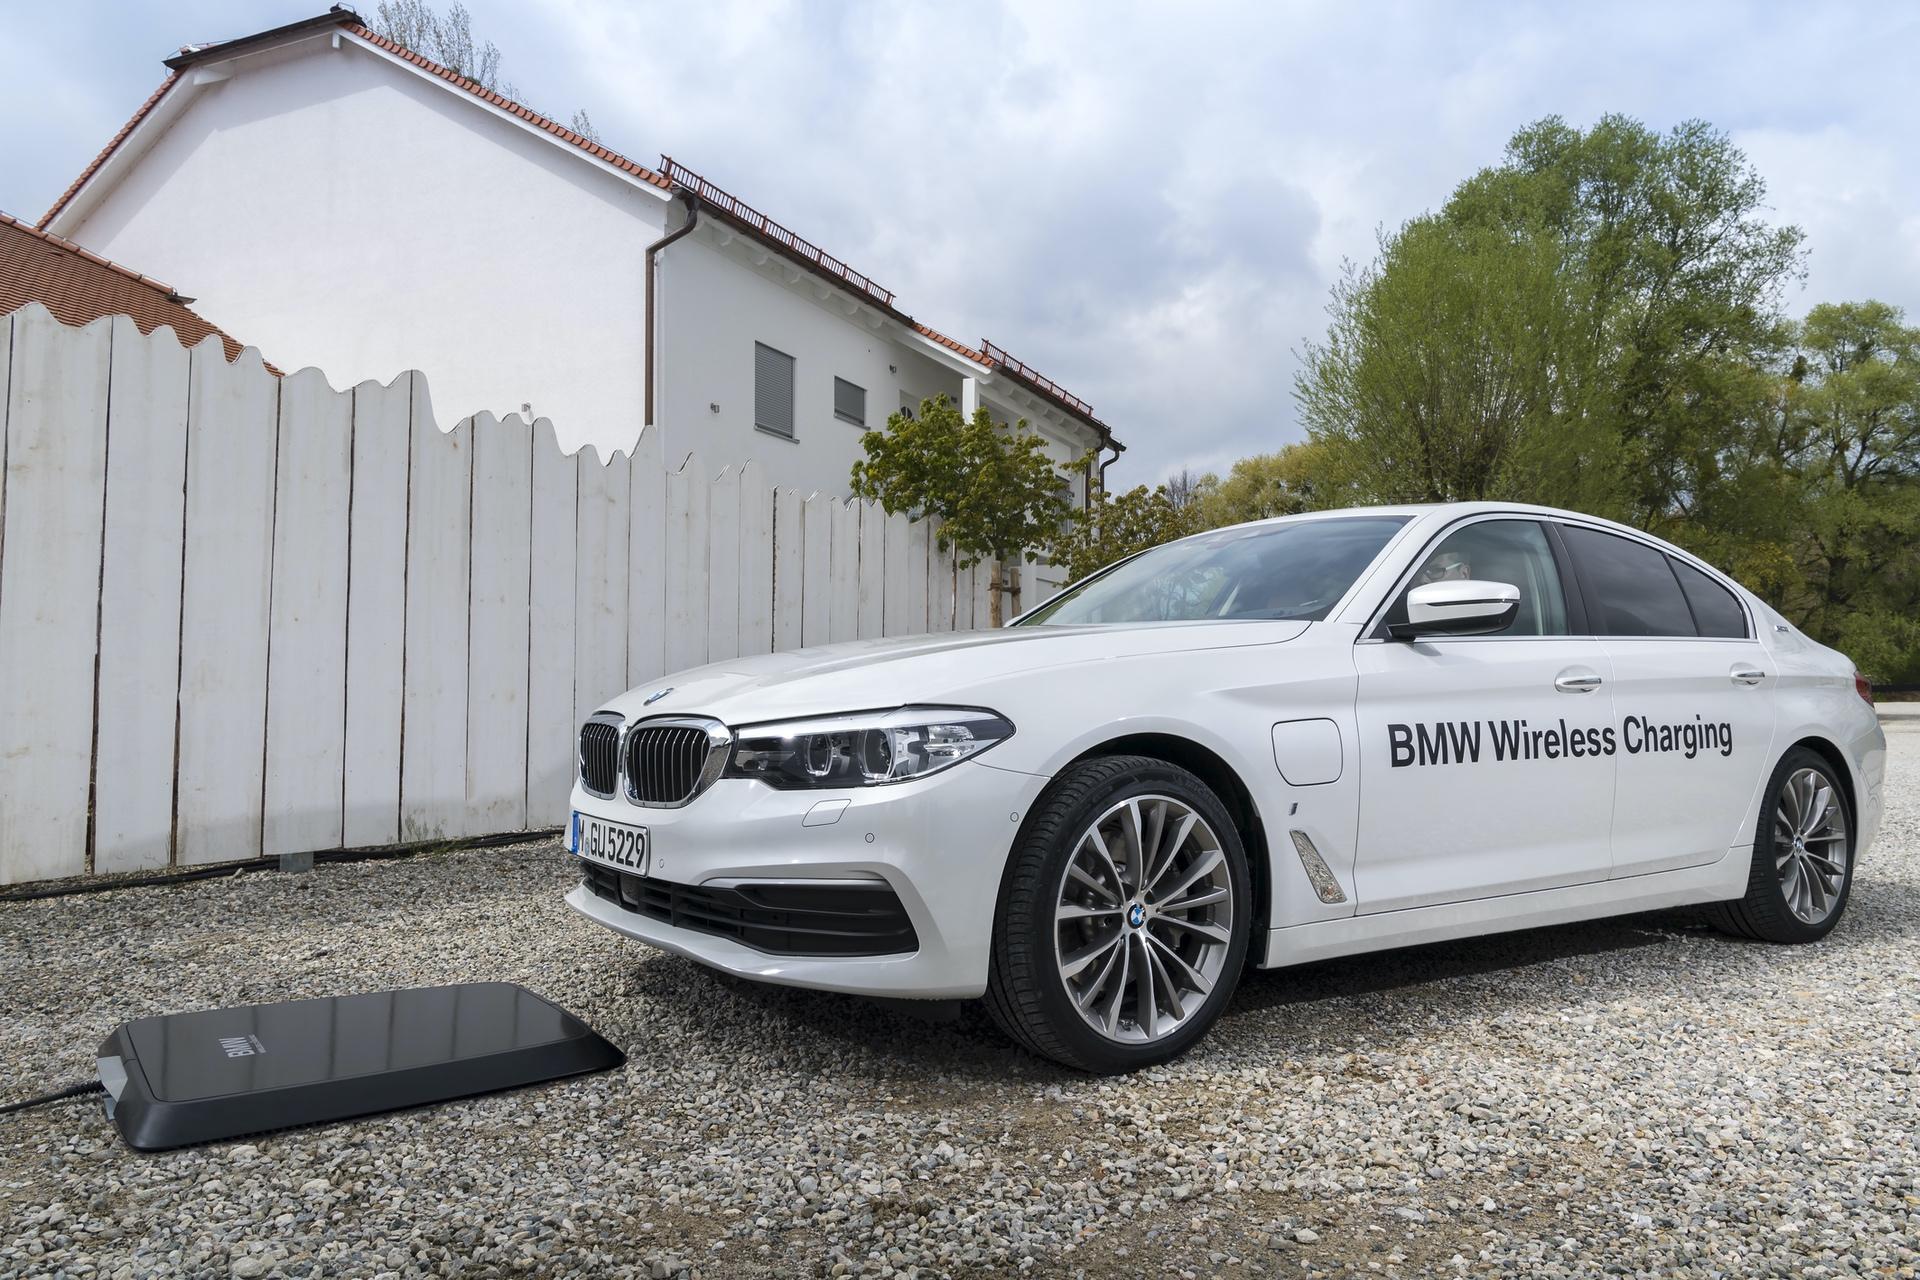 BMW Wireless Charging 02